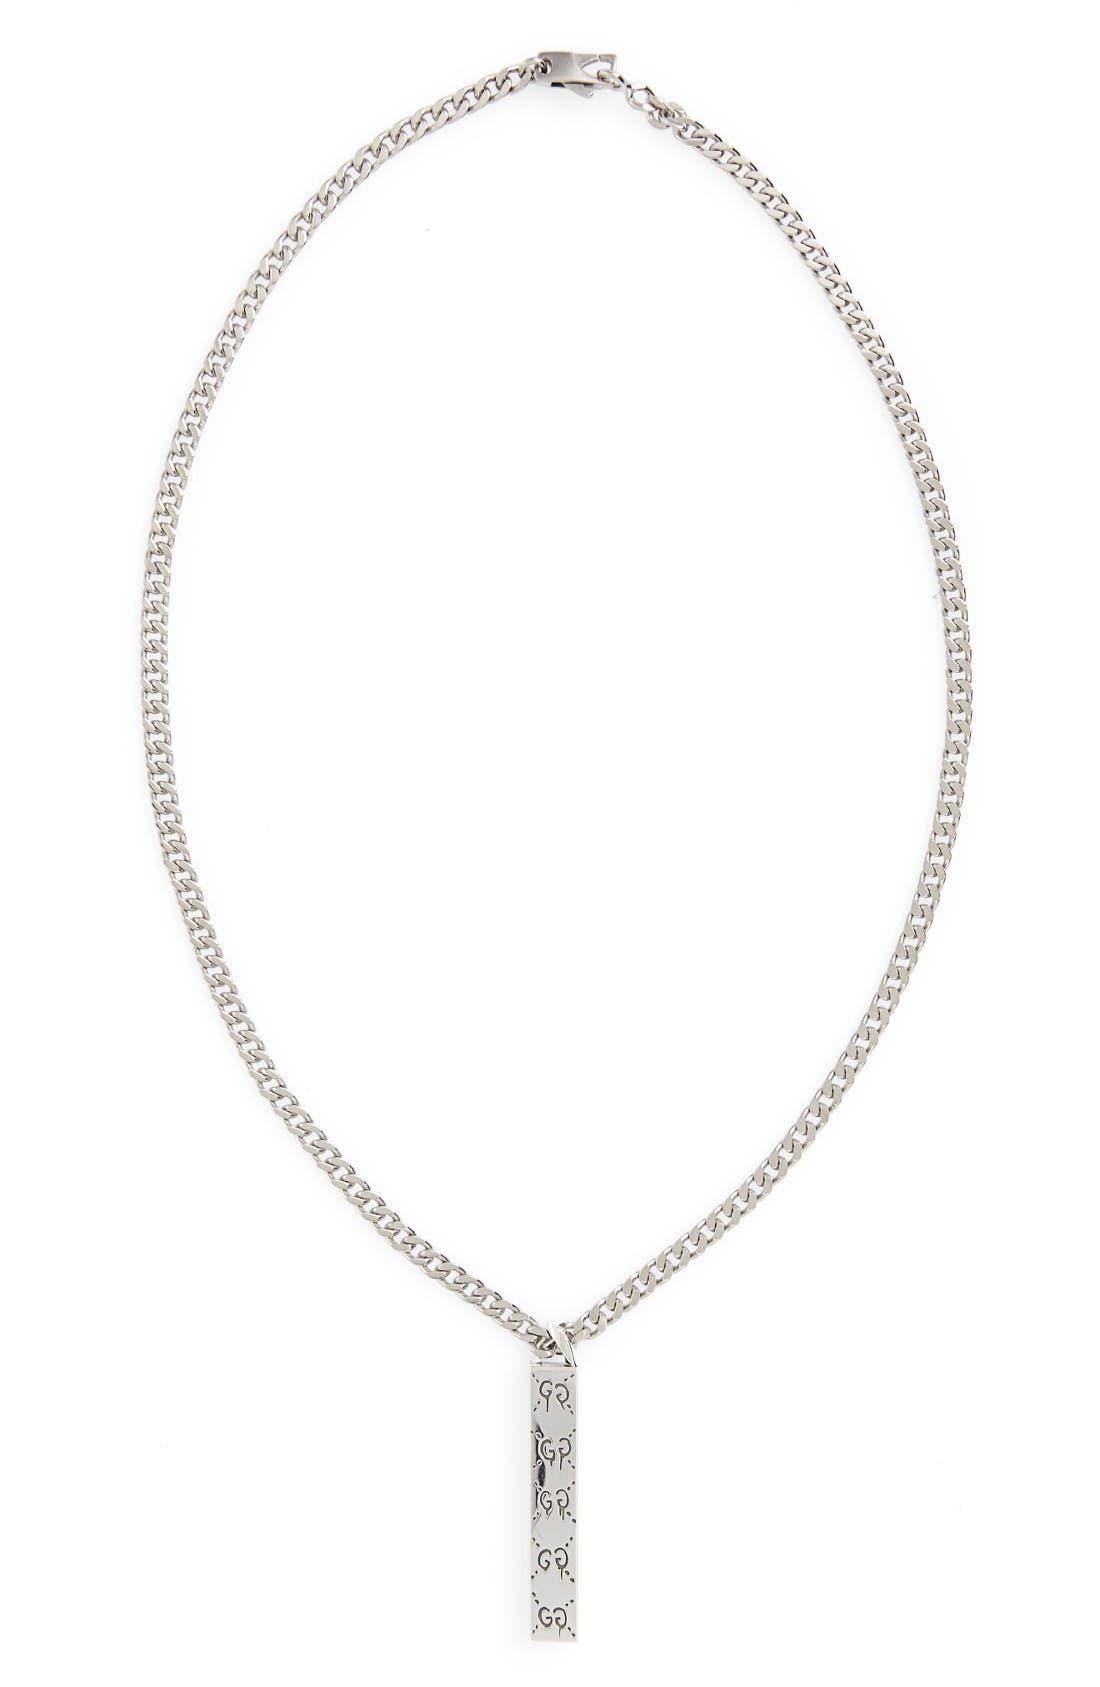 gucci necklace mens. gucci ghost motif pendant necklace mens 1